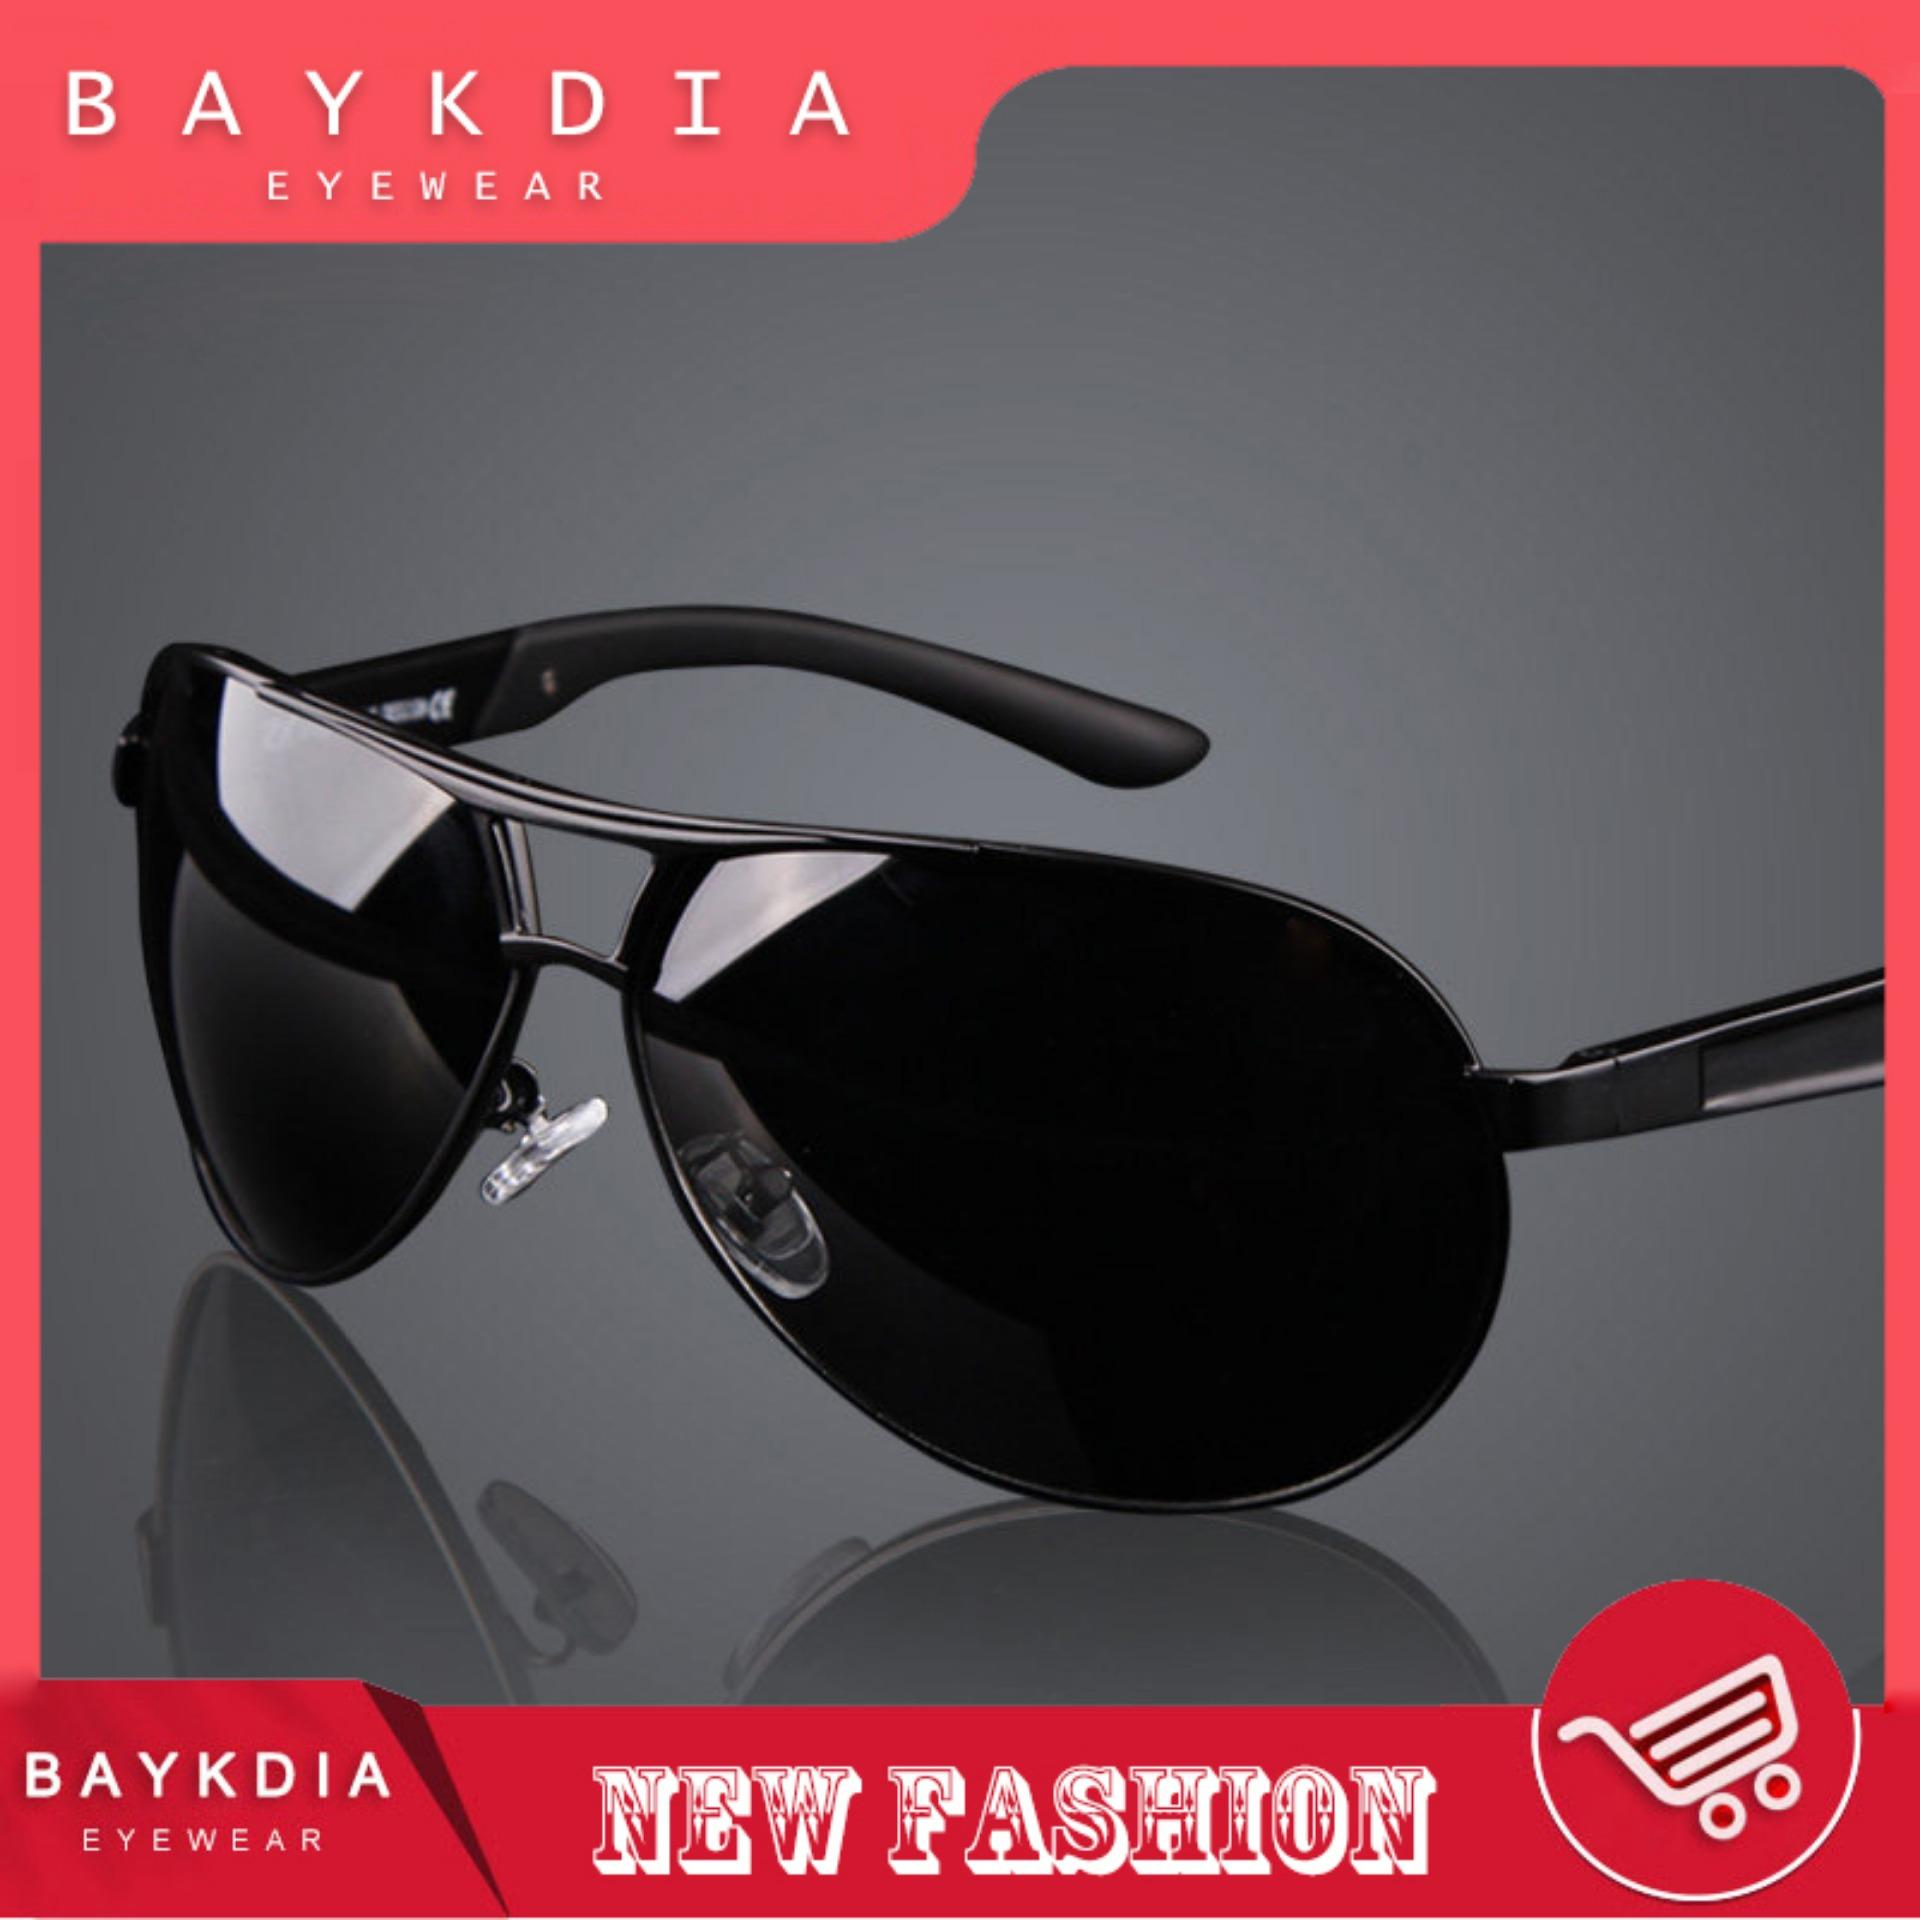 791e802b9 RAYKDIA Pilot Frame Men Fashion Glasses Brand Designer Retro Vintage  Polarized Sunglasses UV400 8005 Black grey